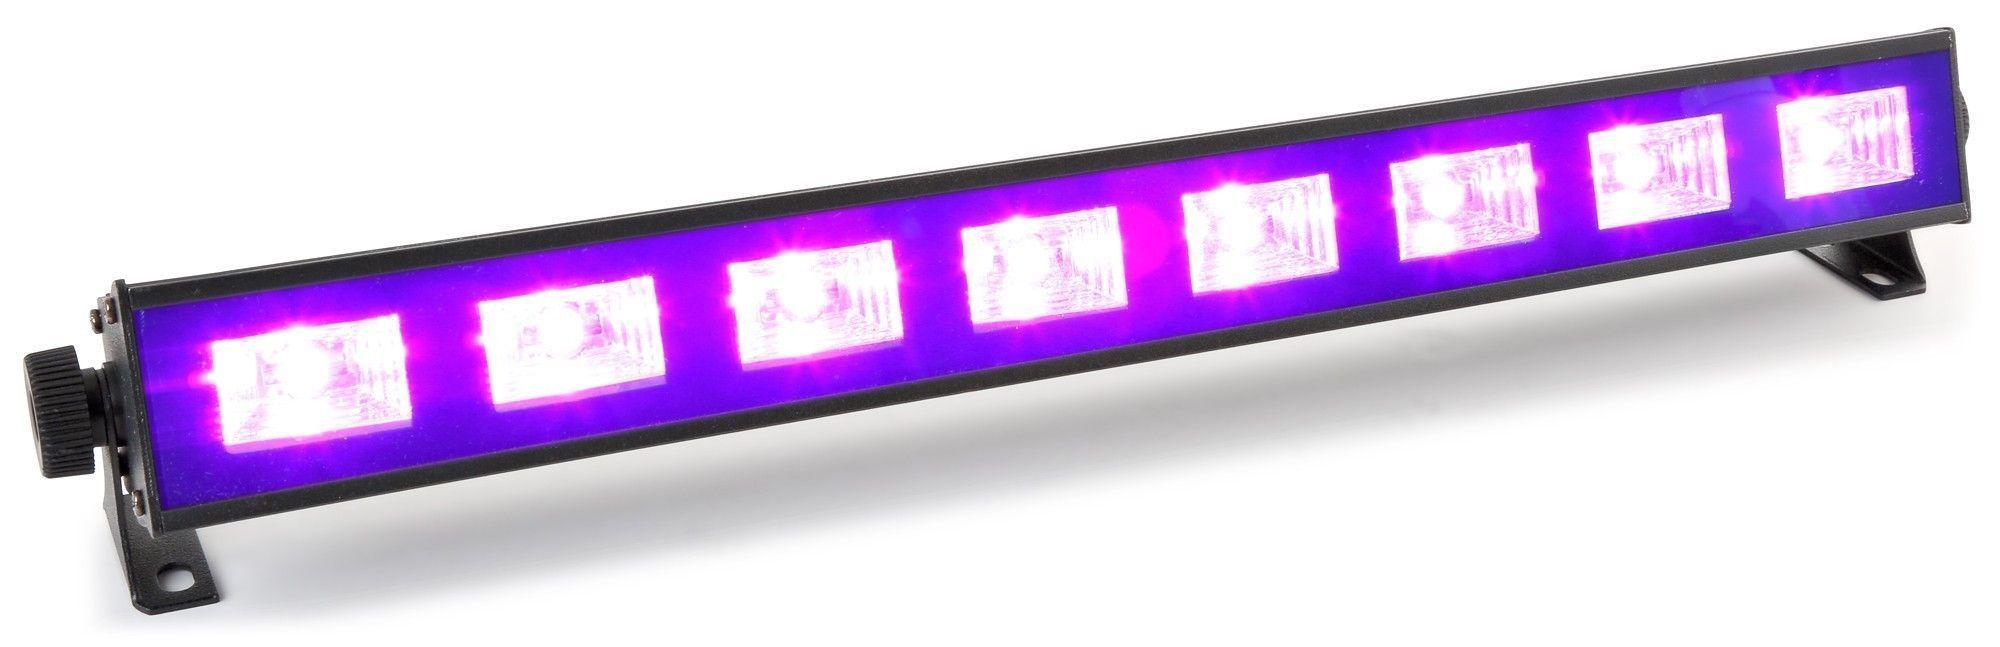 Dagaanbieding: BeamZ BUV93 LED Blacklight BAR met hoge output van 8x 3W